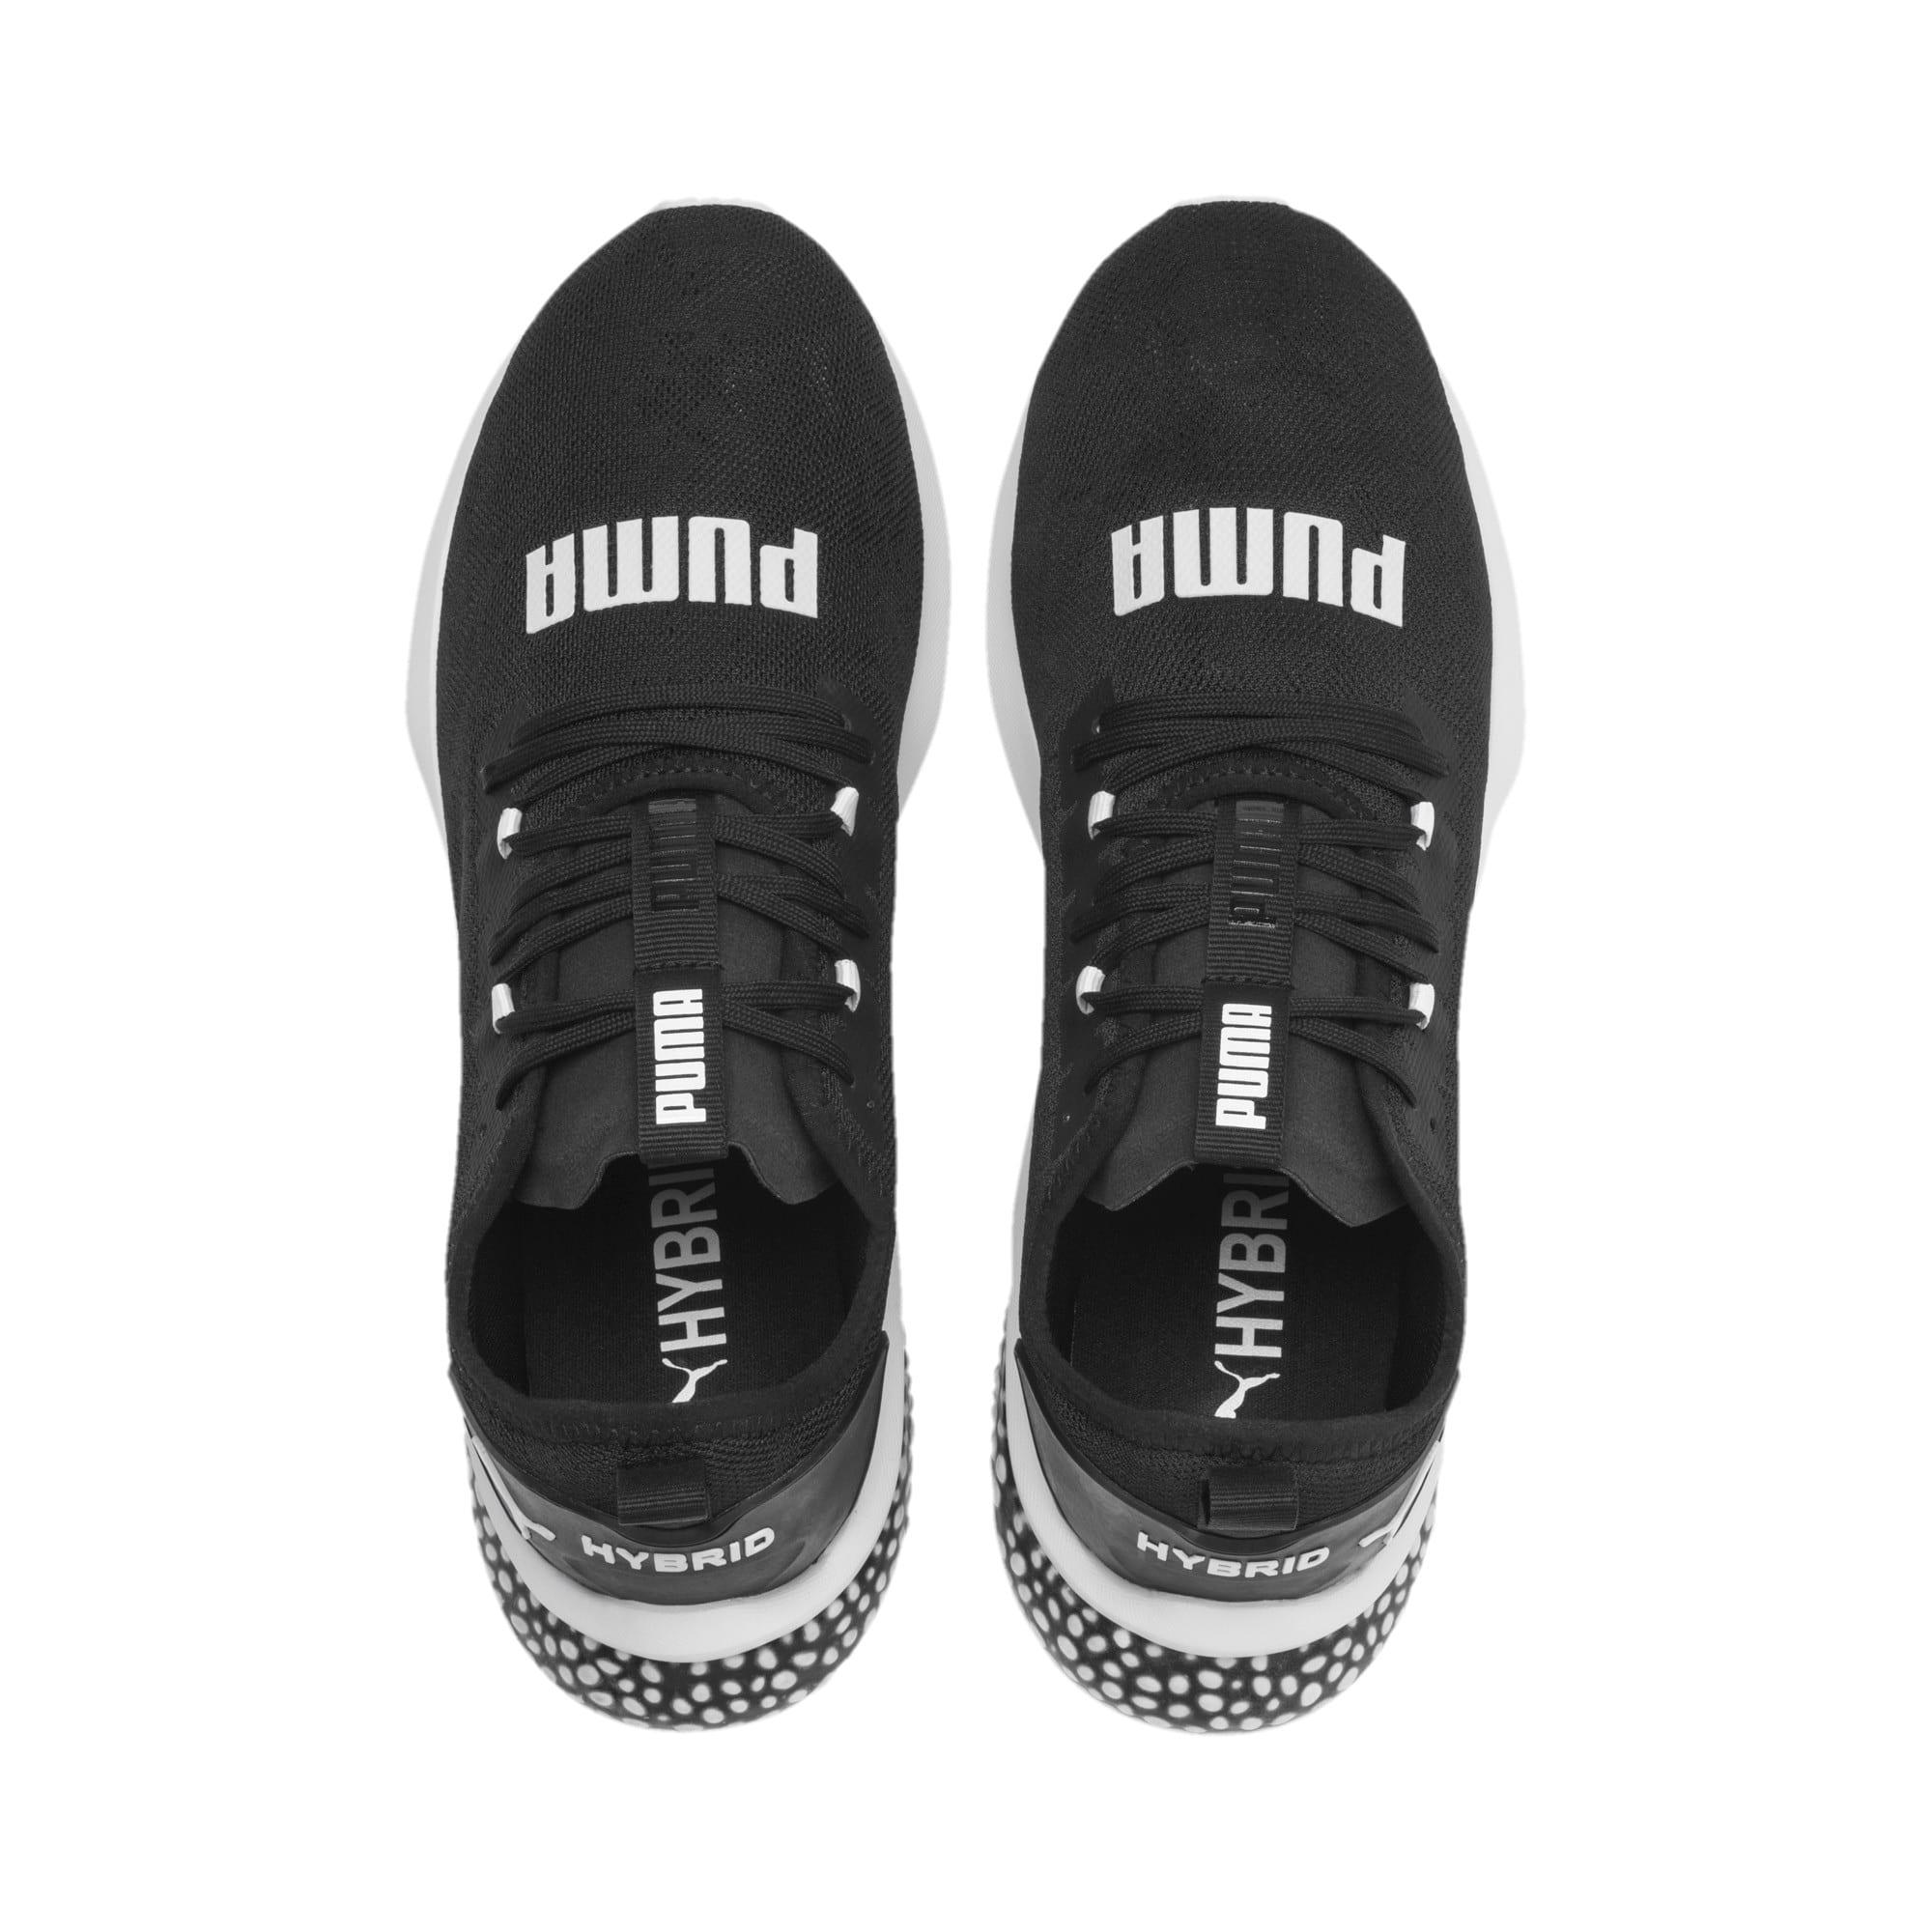 Thumbnail 7 of HYBRID NX Camo Men's Running Shoes, Puma Black-Puma White, medium